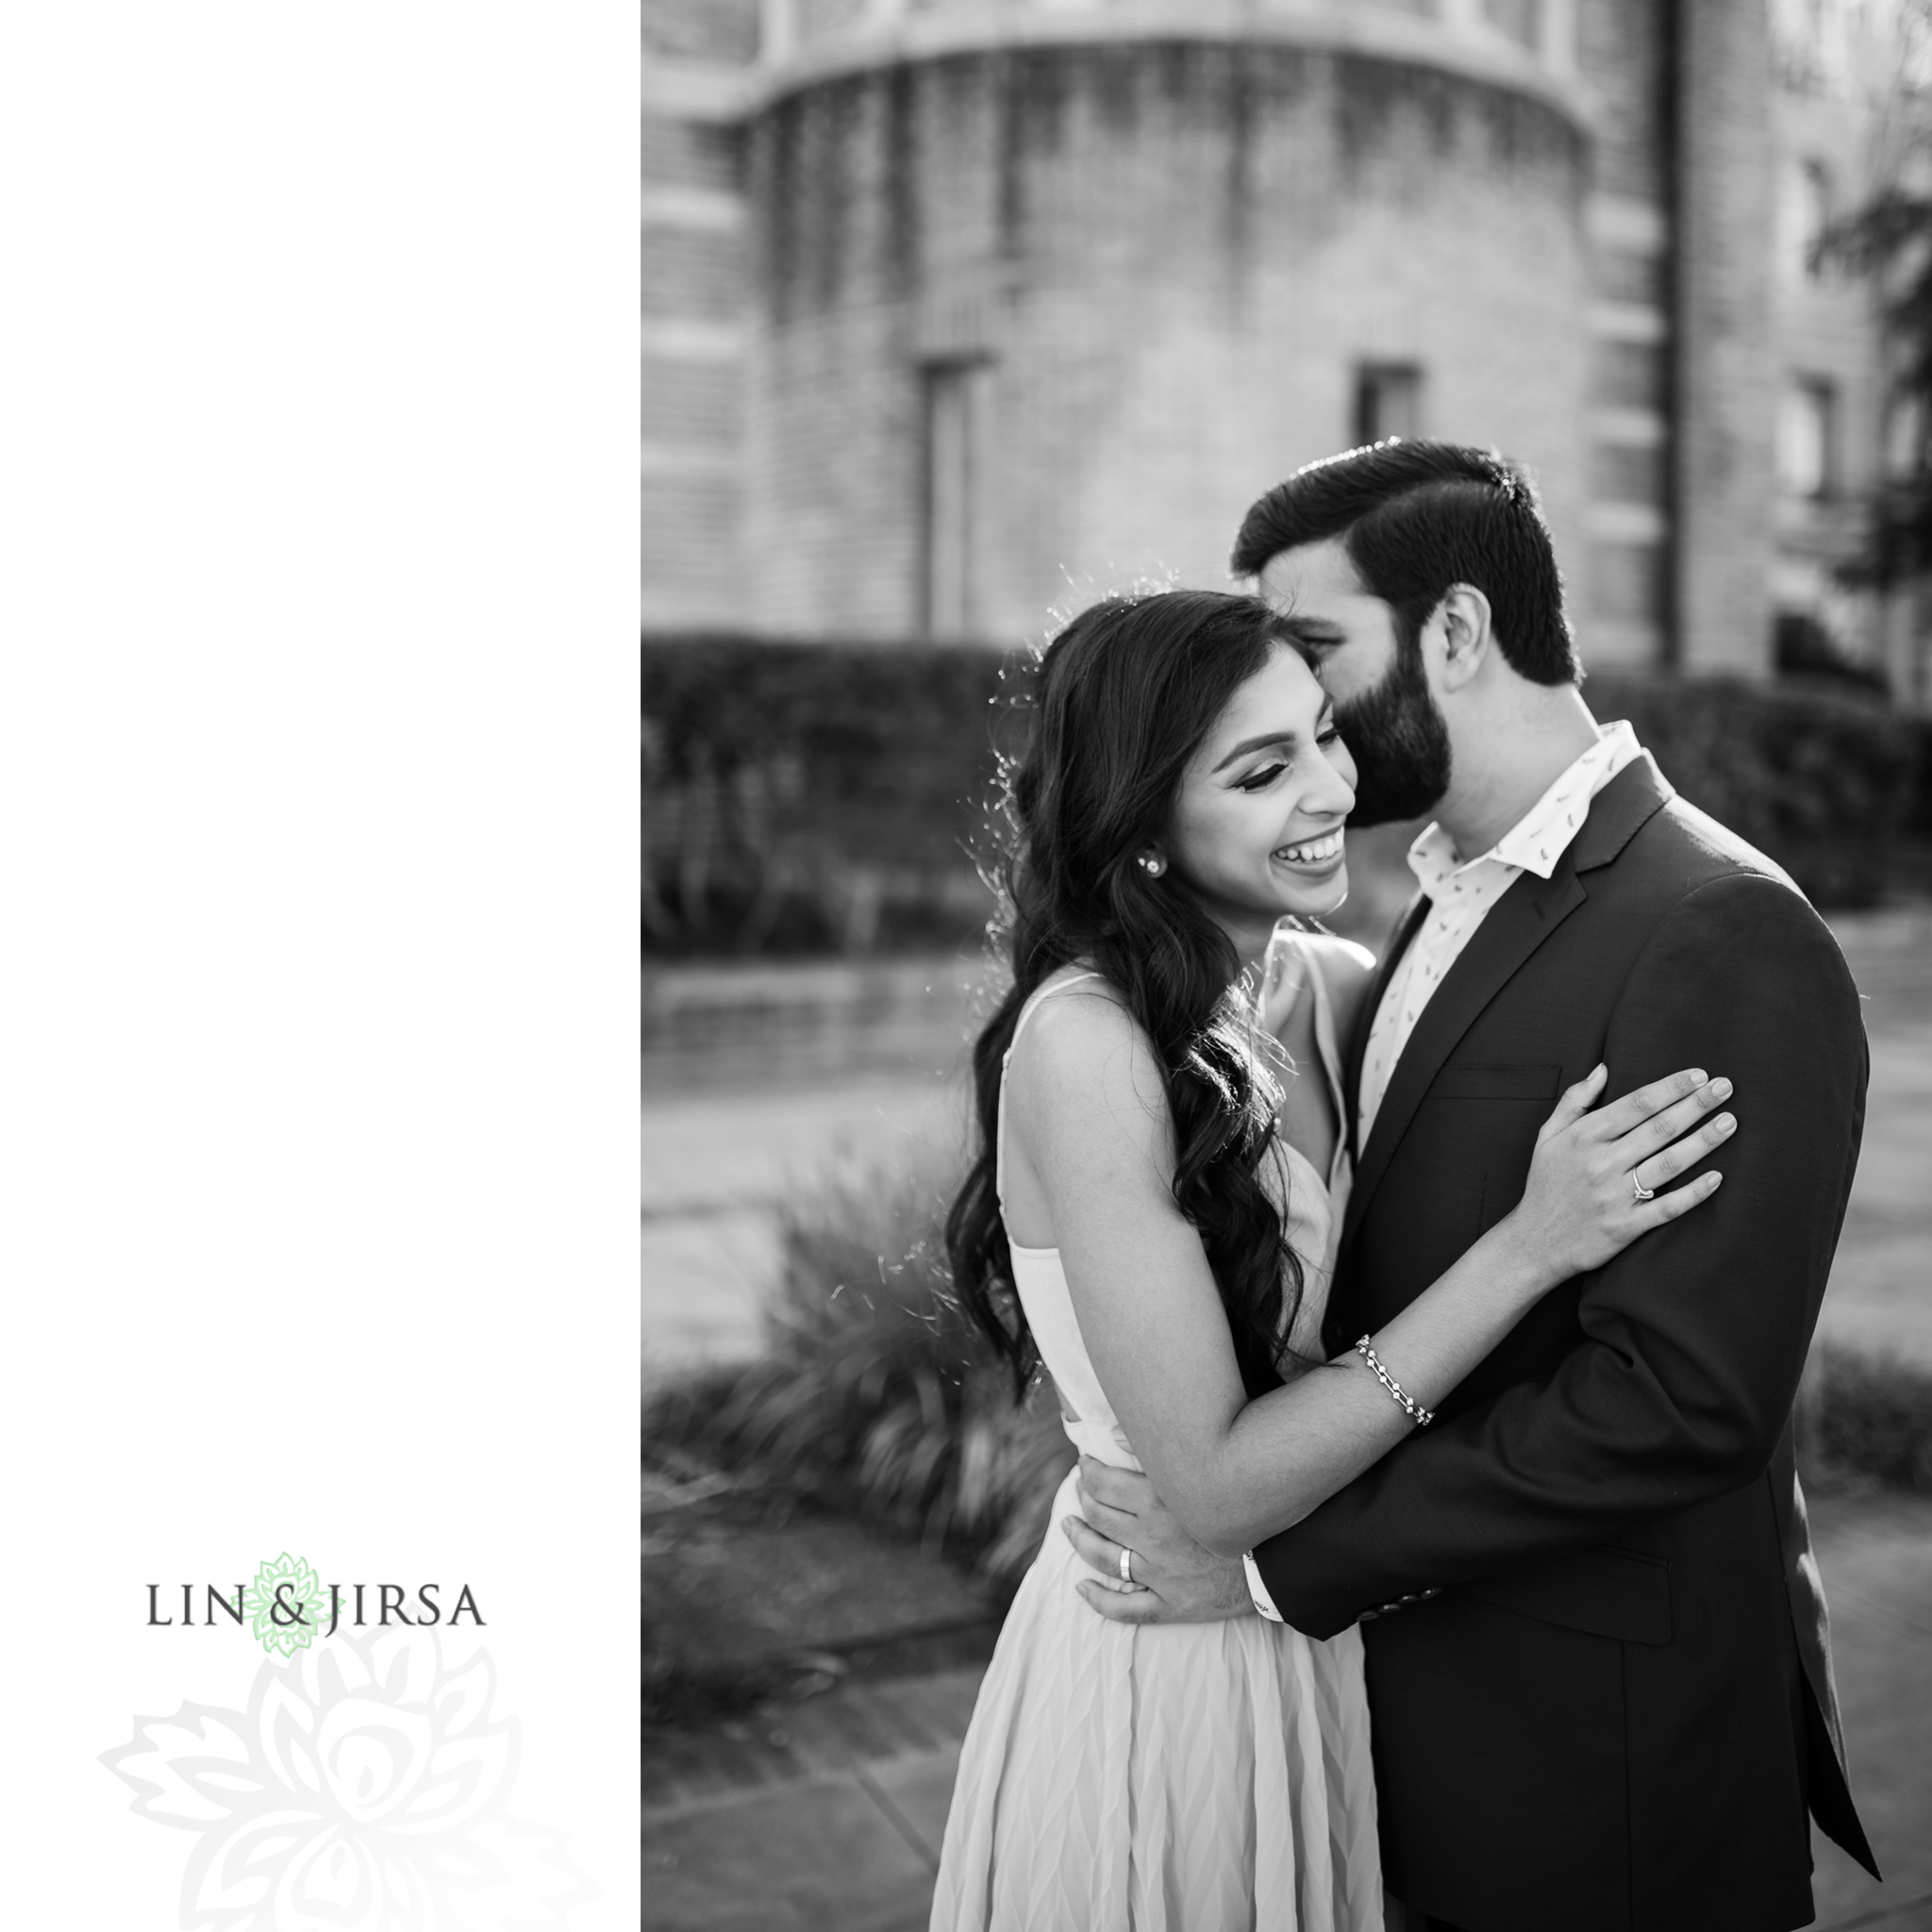 17-UCLA-Los-Angeles-Engagement-Photography